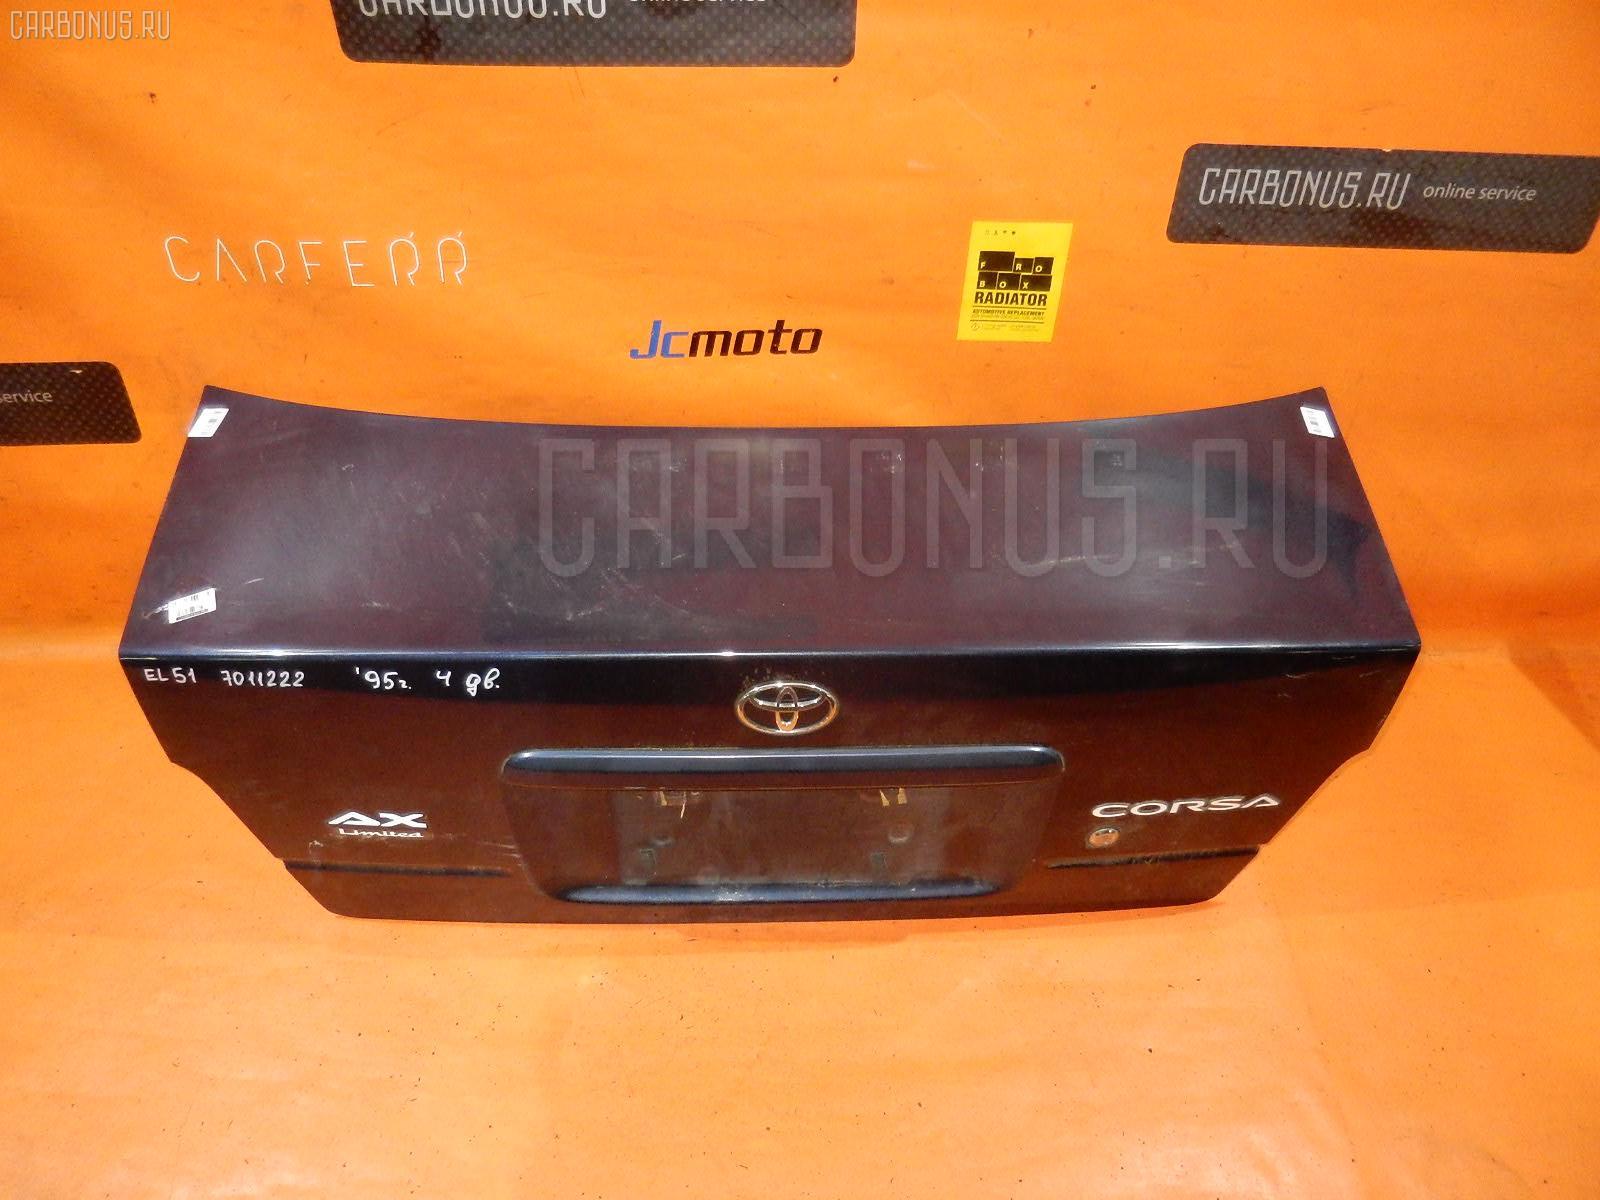 Крышка багажника TOYOTA CORSA EL51 Фото 1